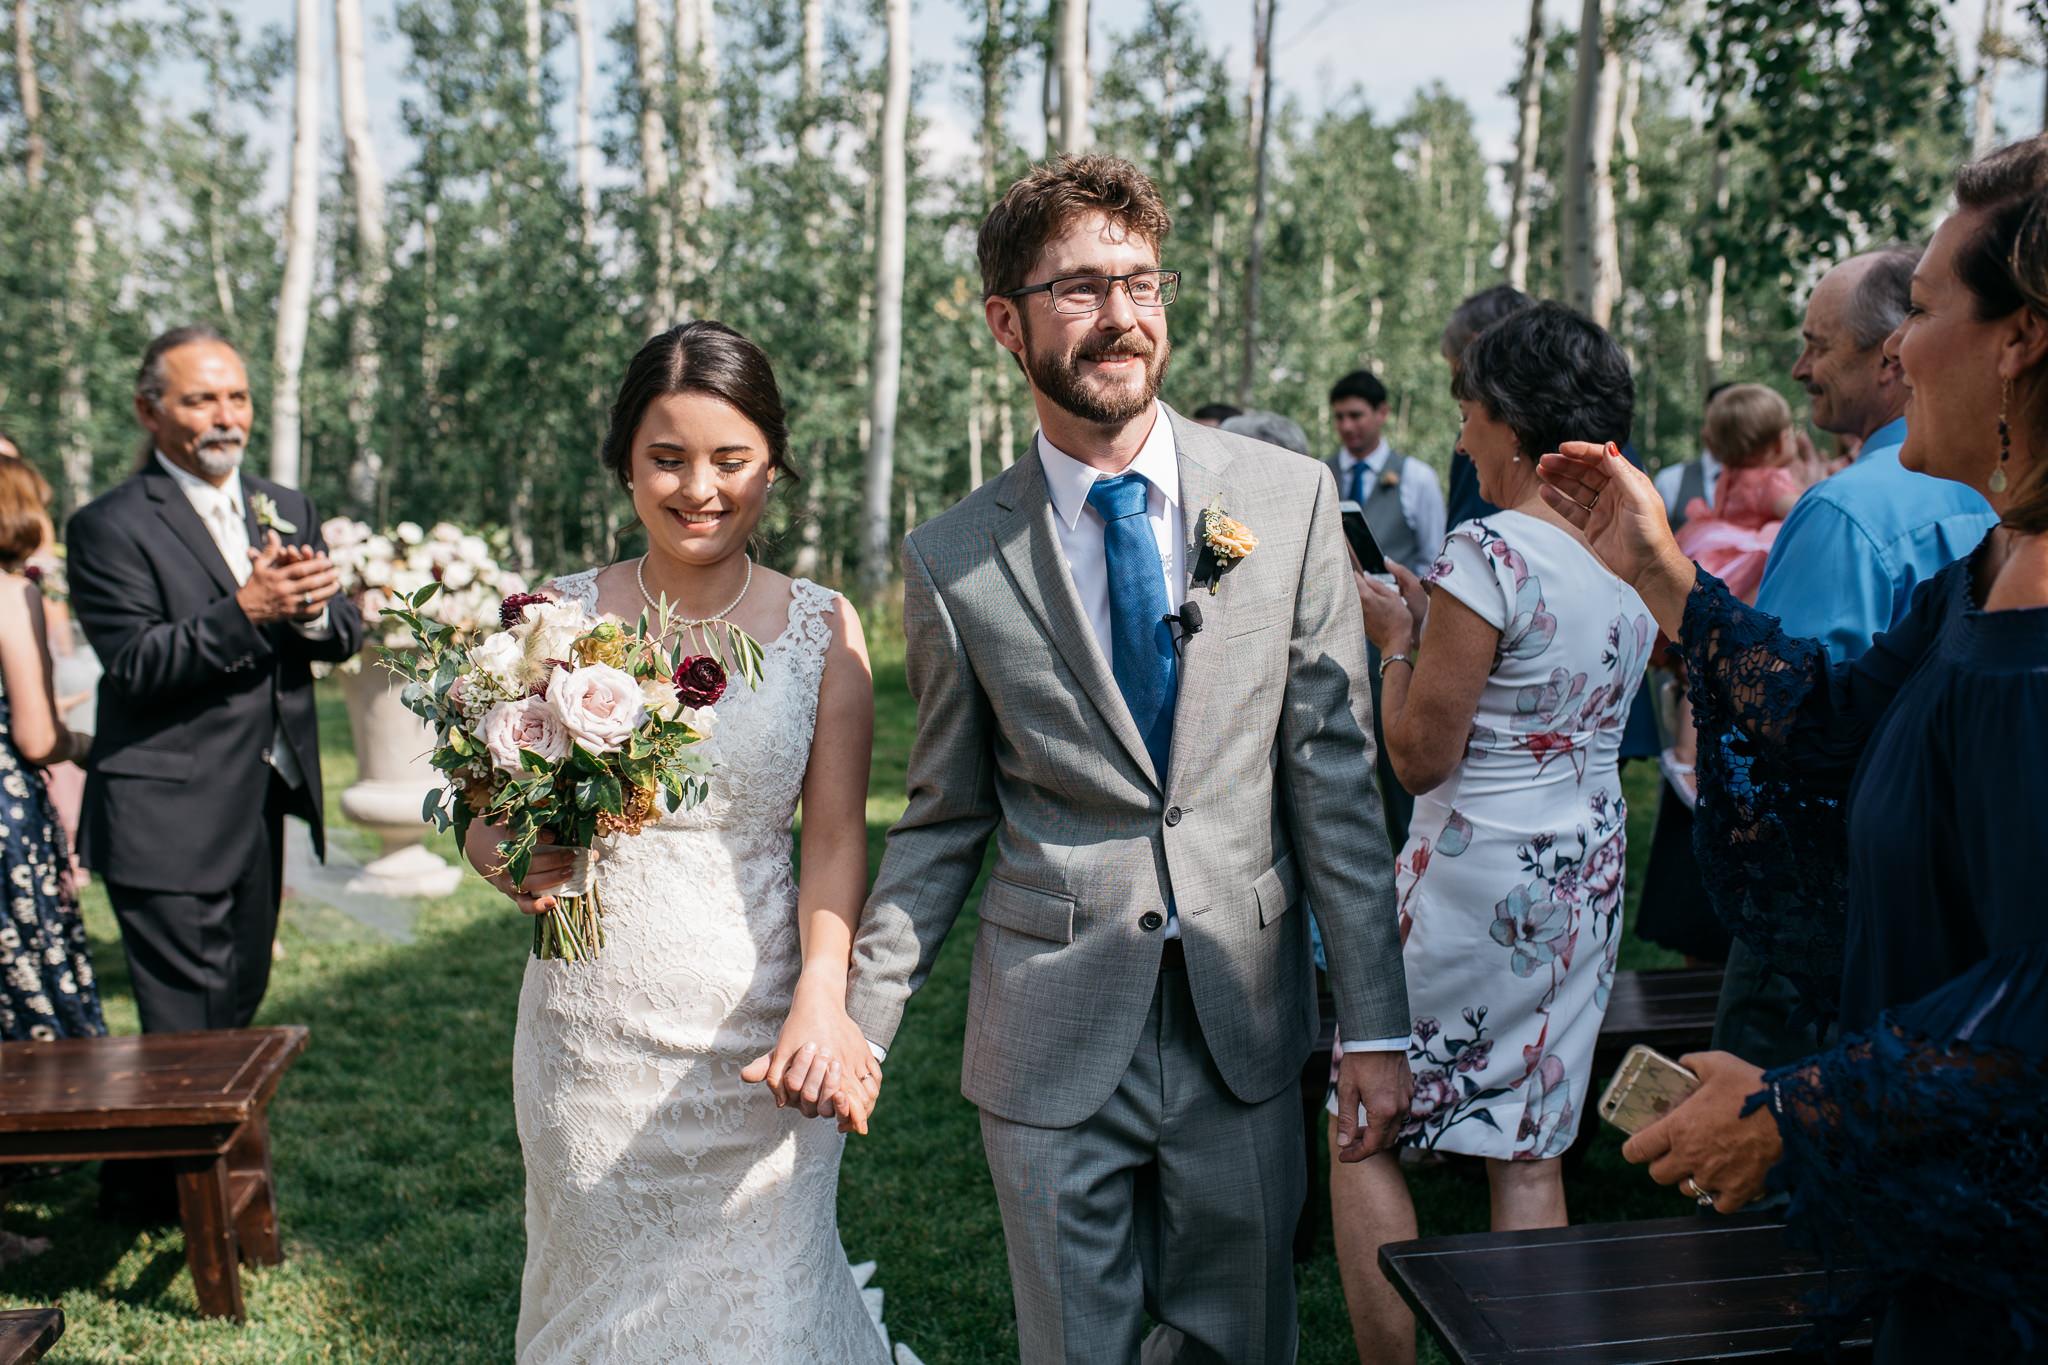 294_ONL_Kat_Nick_Wedding_Trevor_Hooper_Photo.jpg